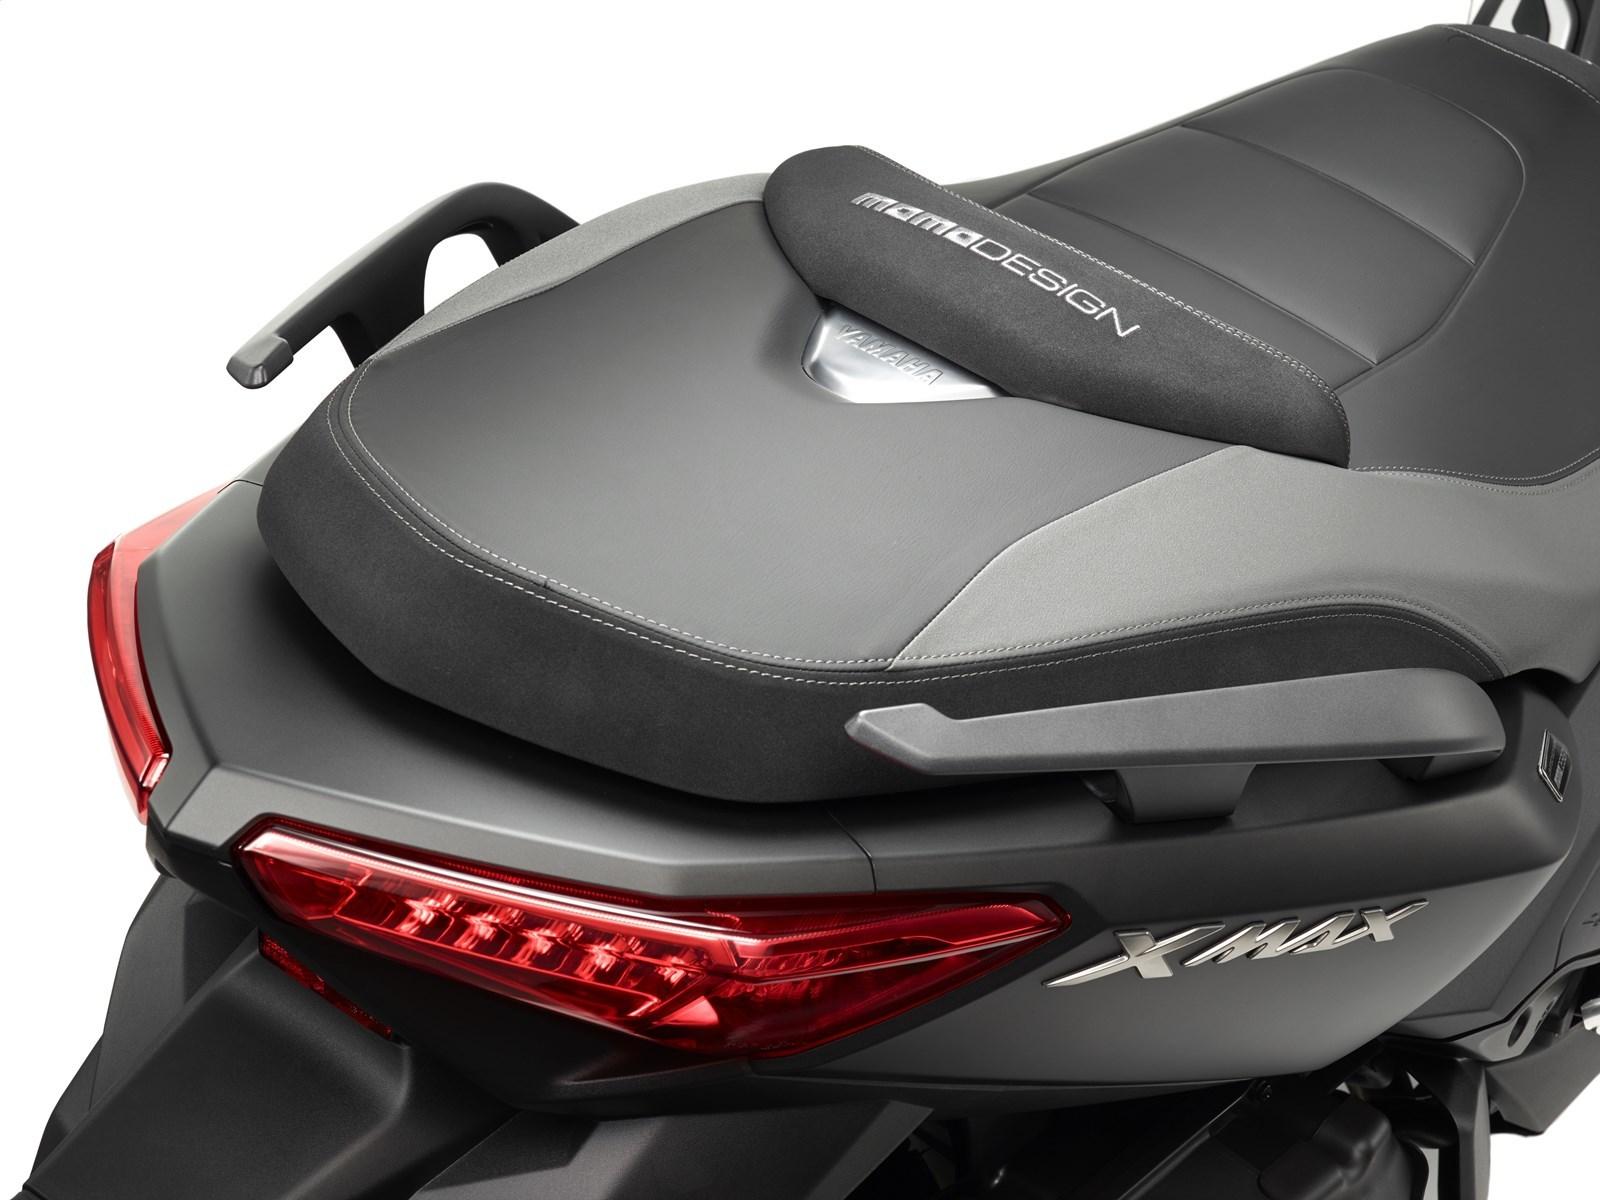 Foto de Yamaha X-MAX 400 MOMODESIGN, estudio y detalles (23/33)